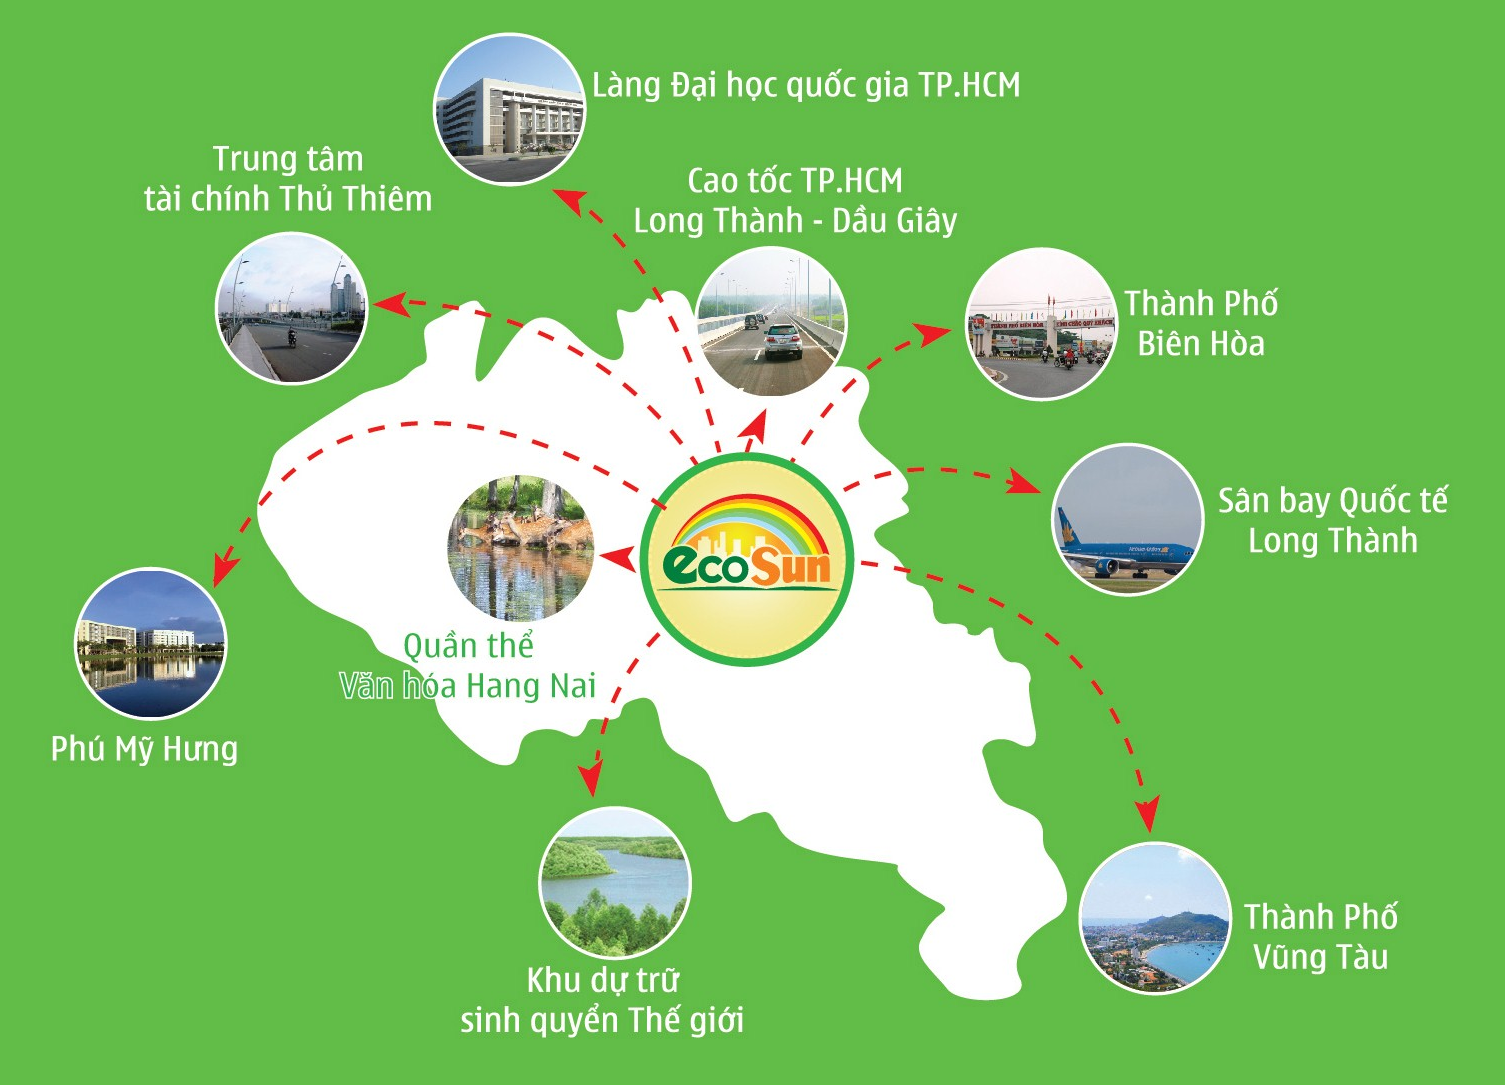 Đất nền dự án  Ecosun Nhơn Trạch